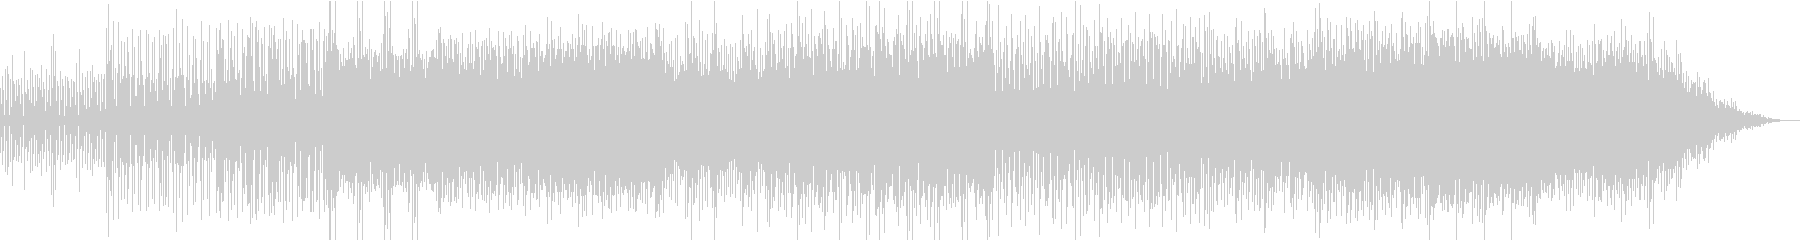 Downtempo Techno Popの未再生の波形